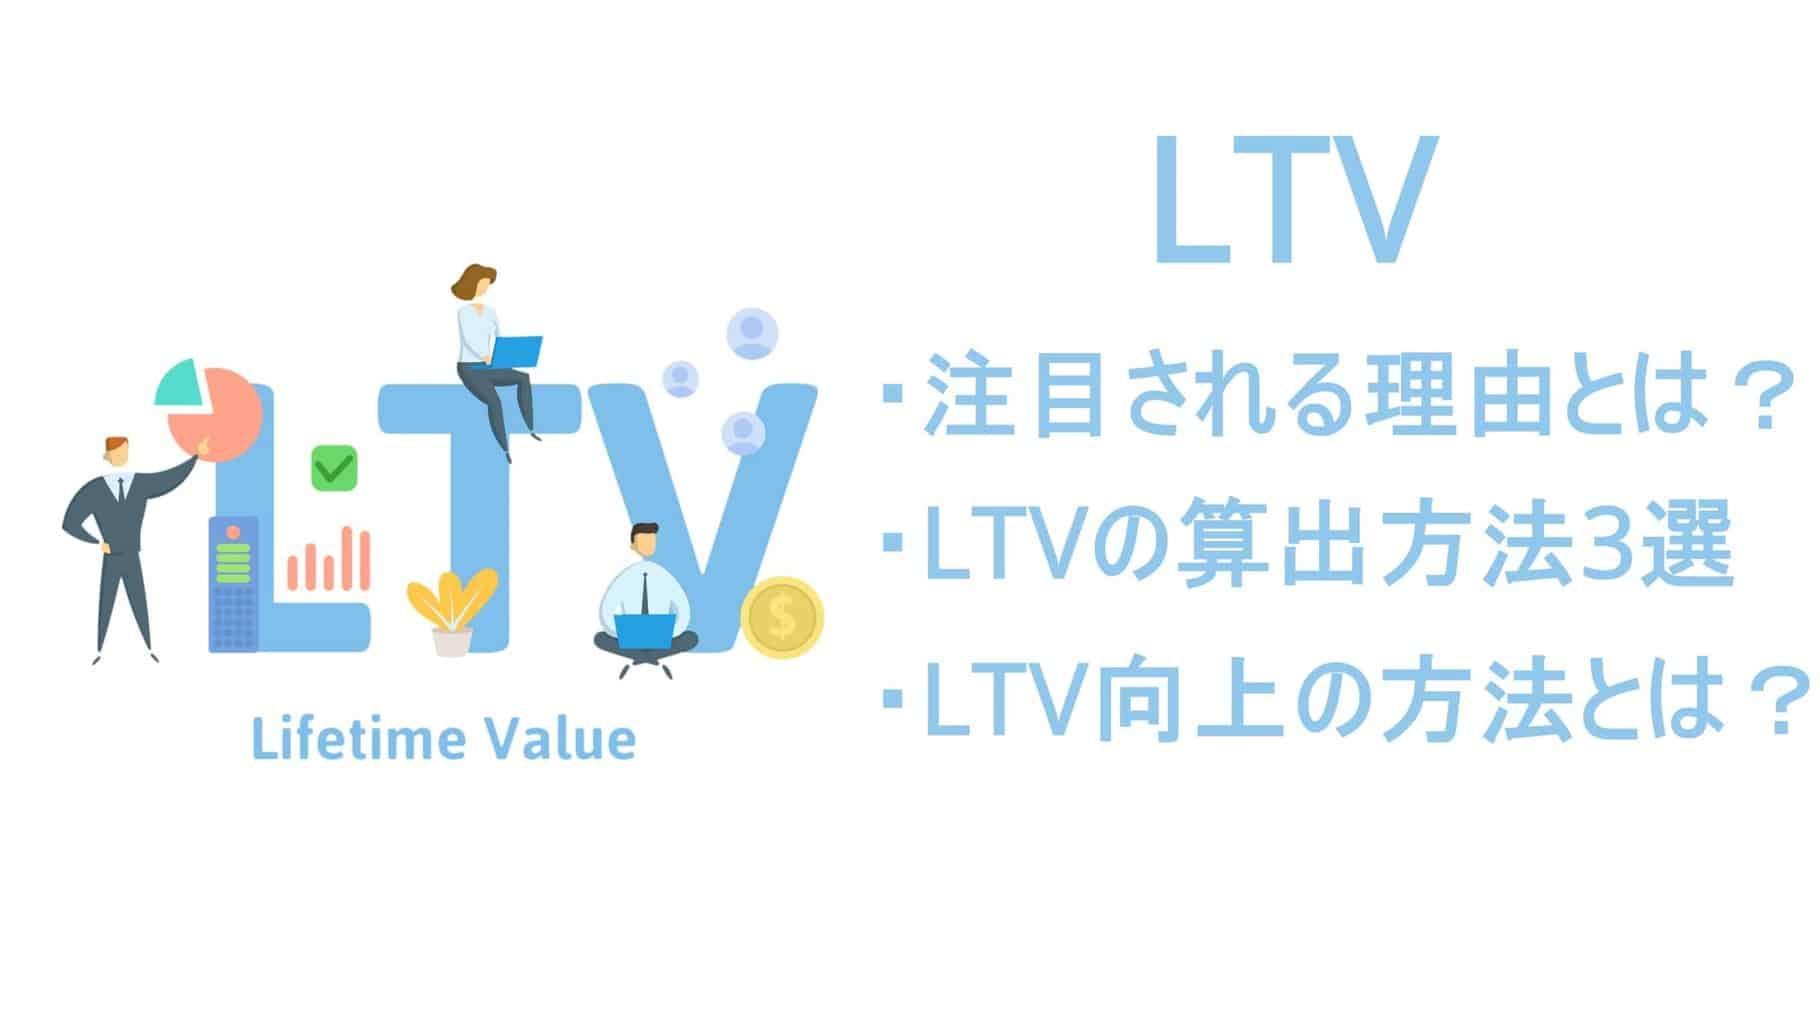 LTVはマーケティングに欠かせない?LTVを高める方法や算出方法も紹介!